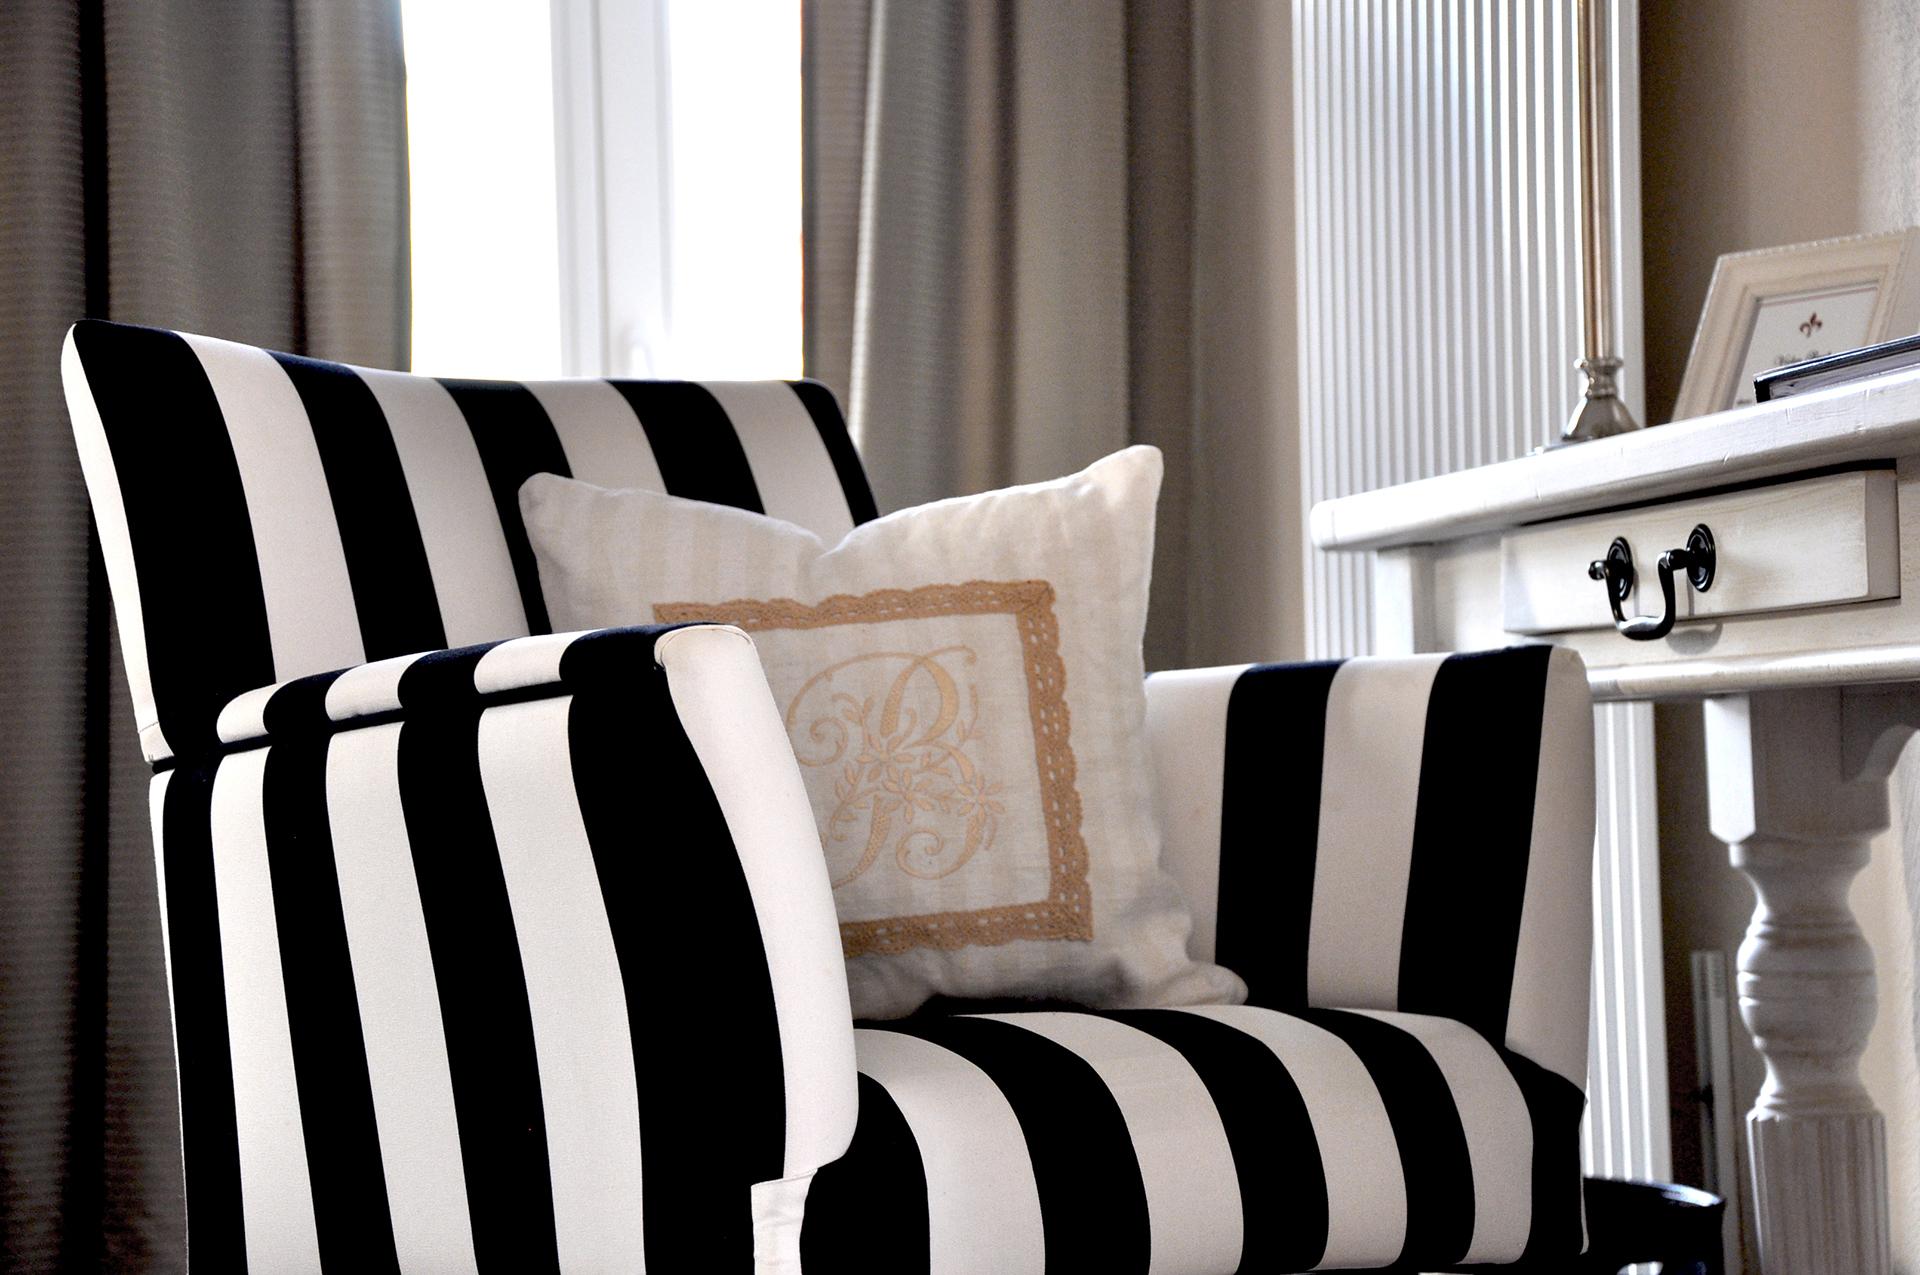 interior design | klosterhotel neuzelle